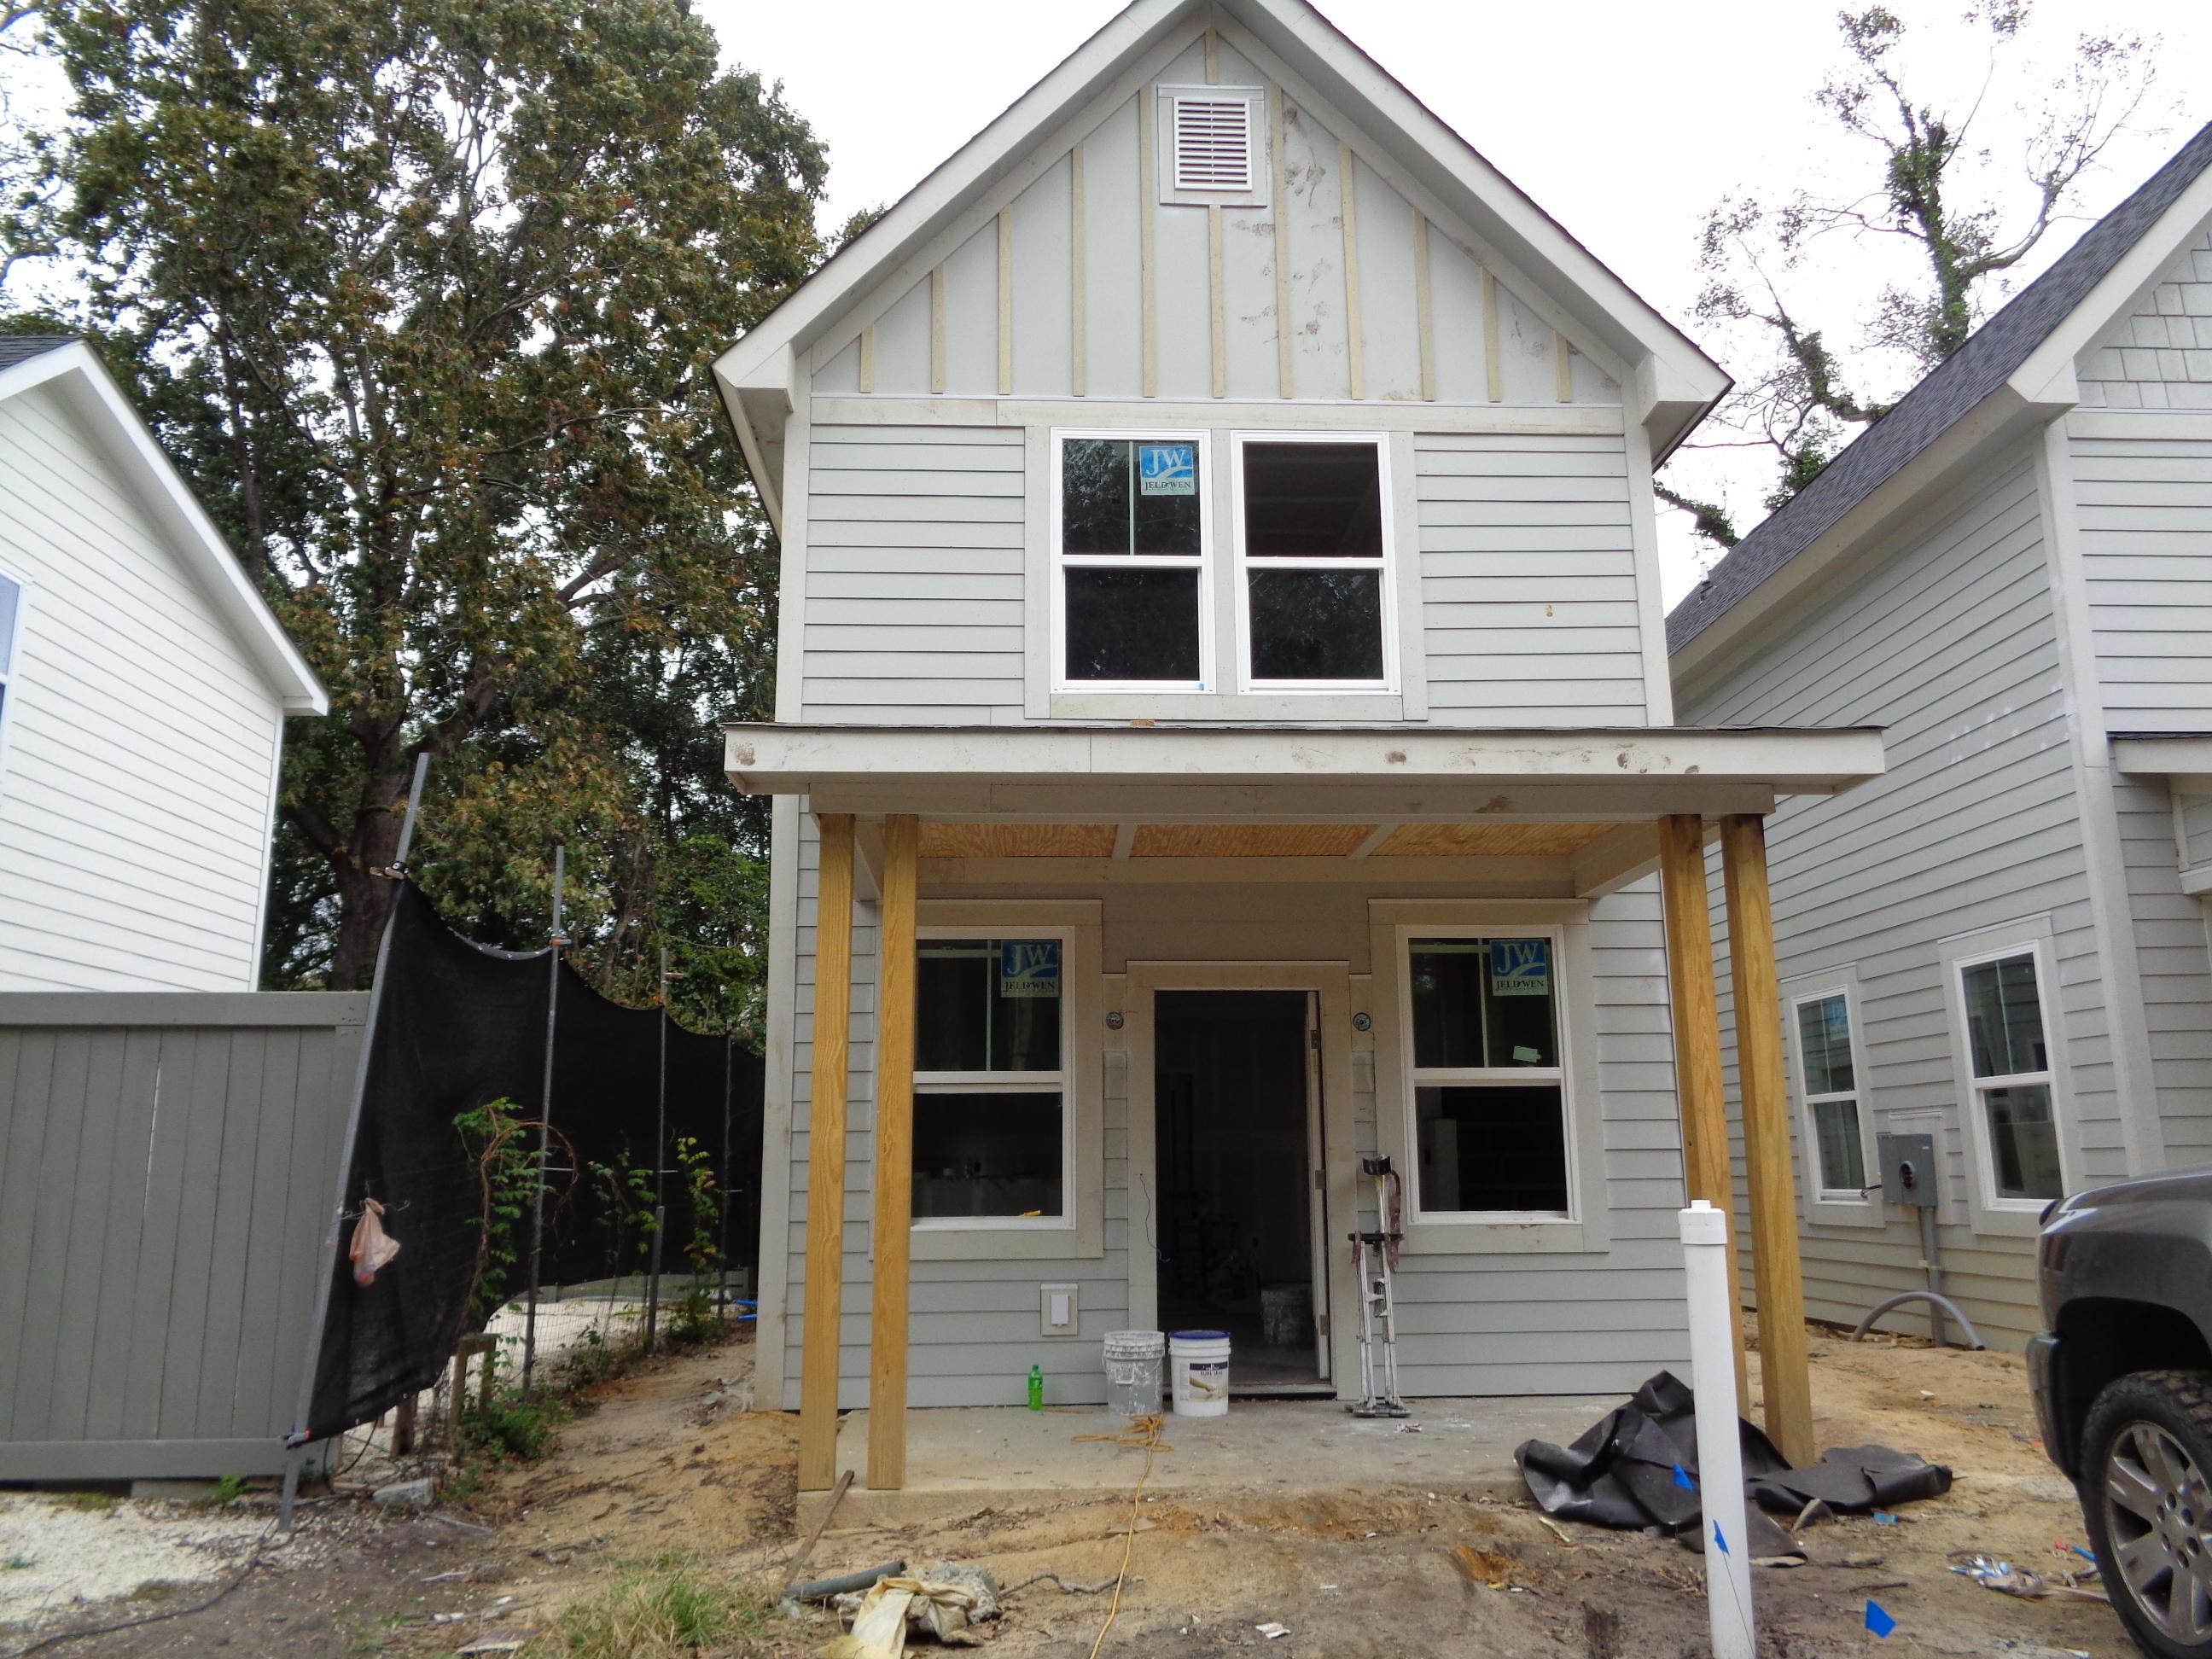 Pinecrest Gardens Homes For Sale - 1630 Wappoo, Charleston, SC - 12